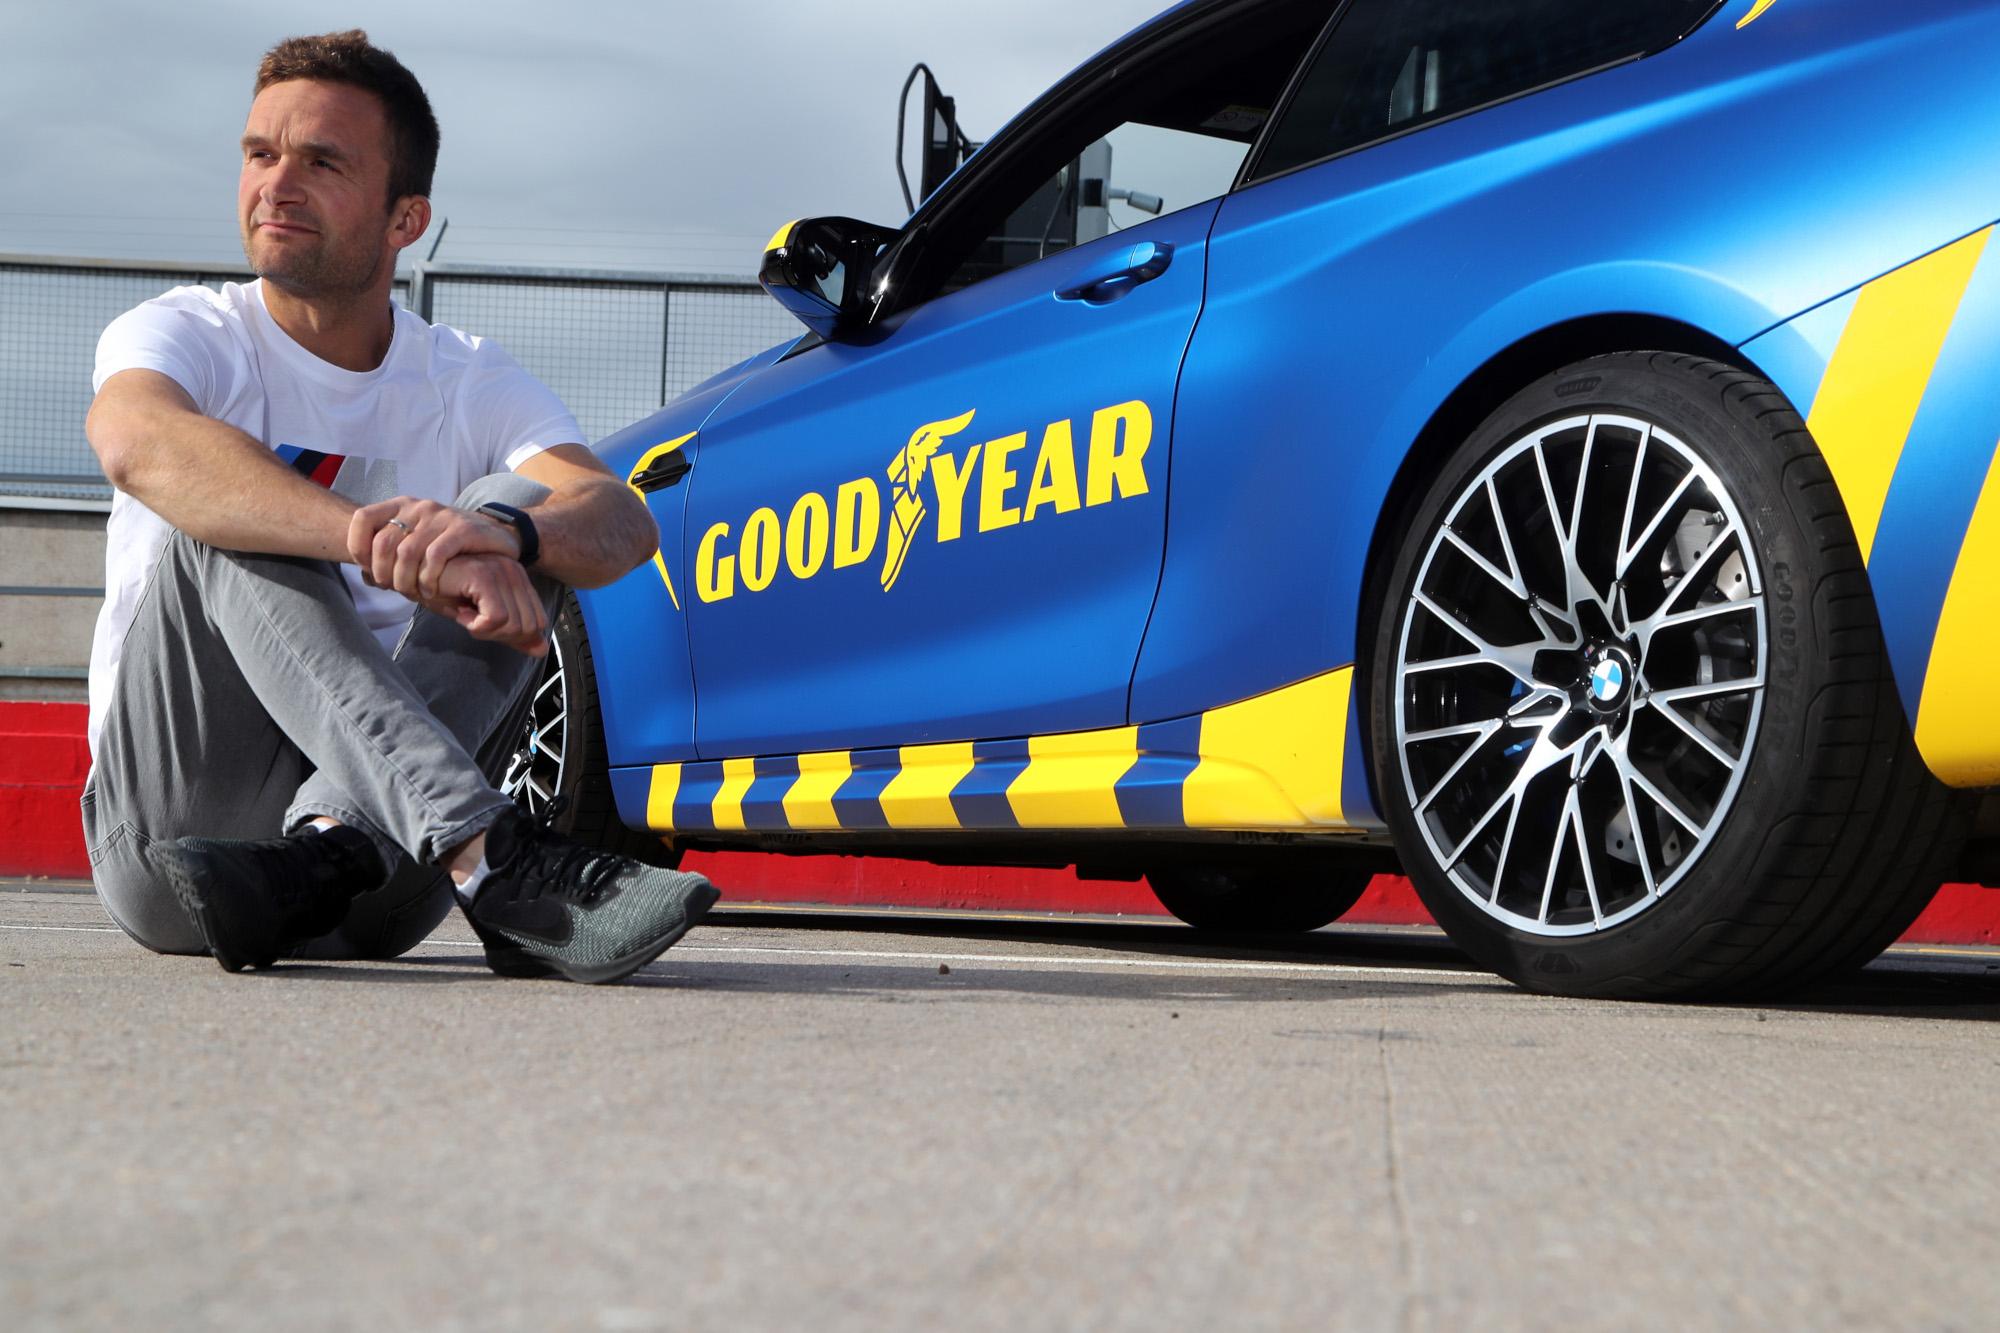 BTCC champion tests Goodyear Eagle F1 SuperSport tyres at Donington